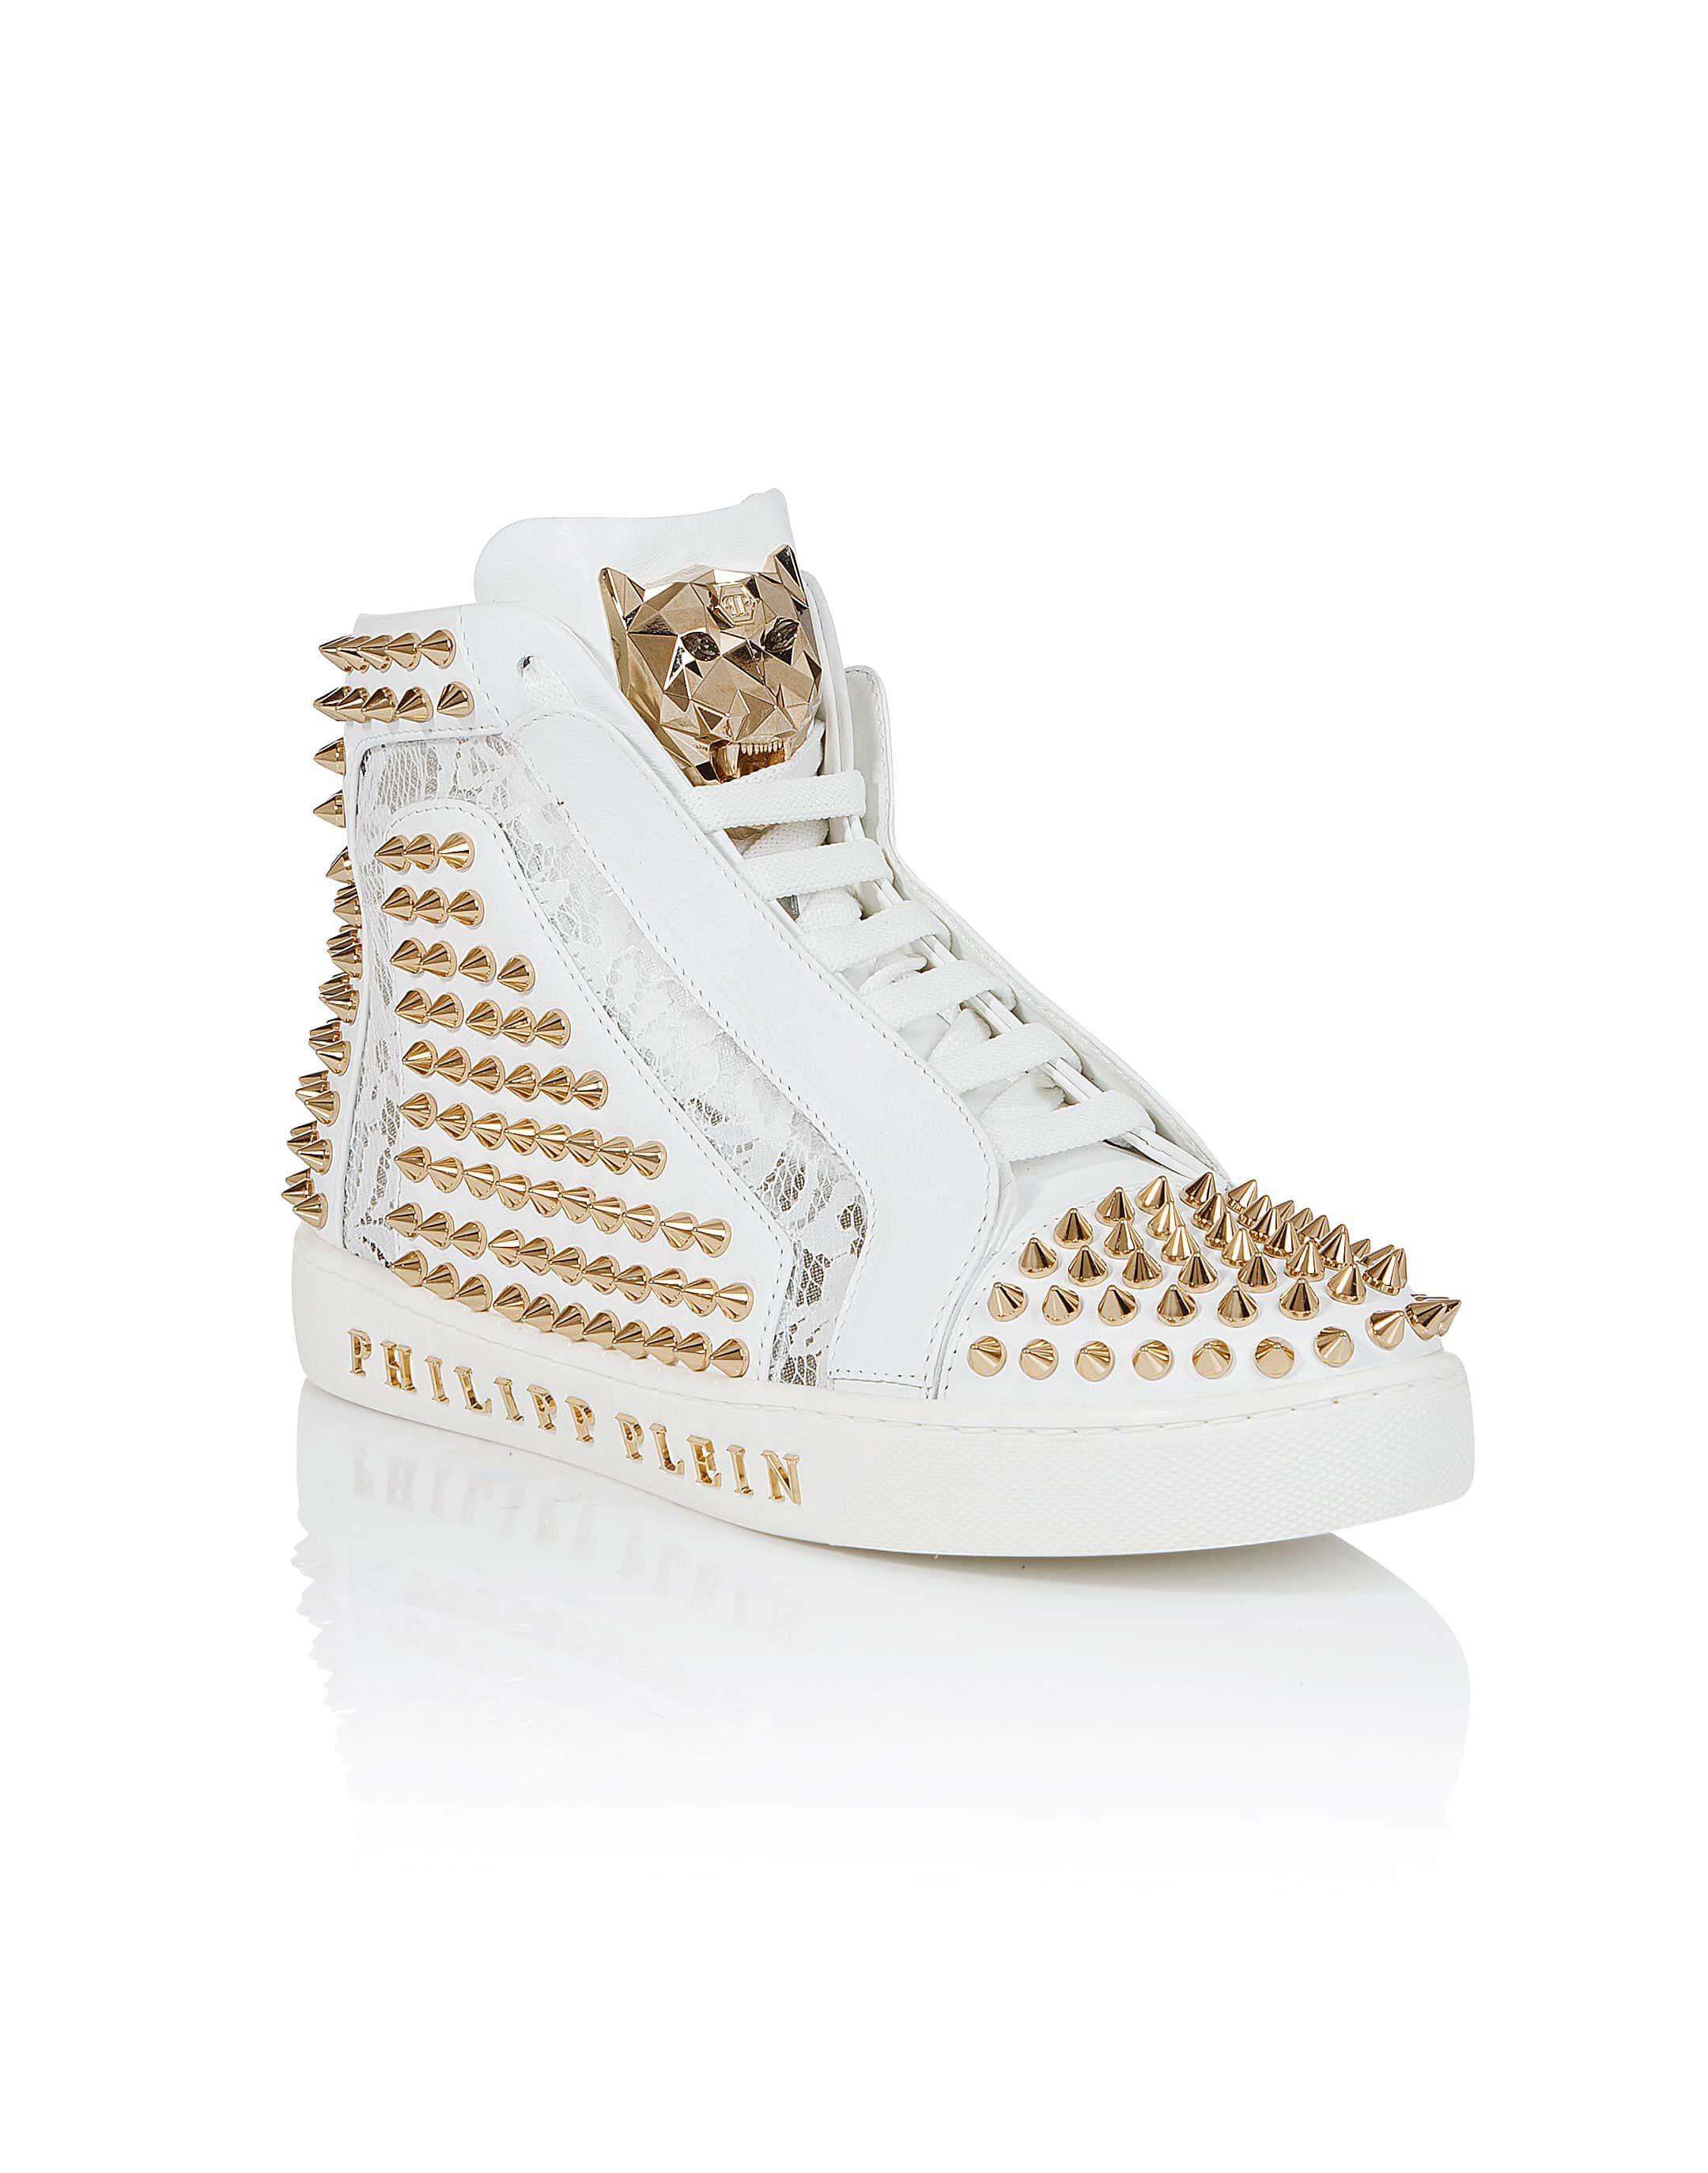 "Philipp PleinHi-Top Sneakers ""Everybody on the floor"""